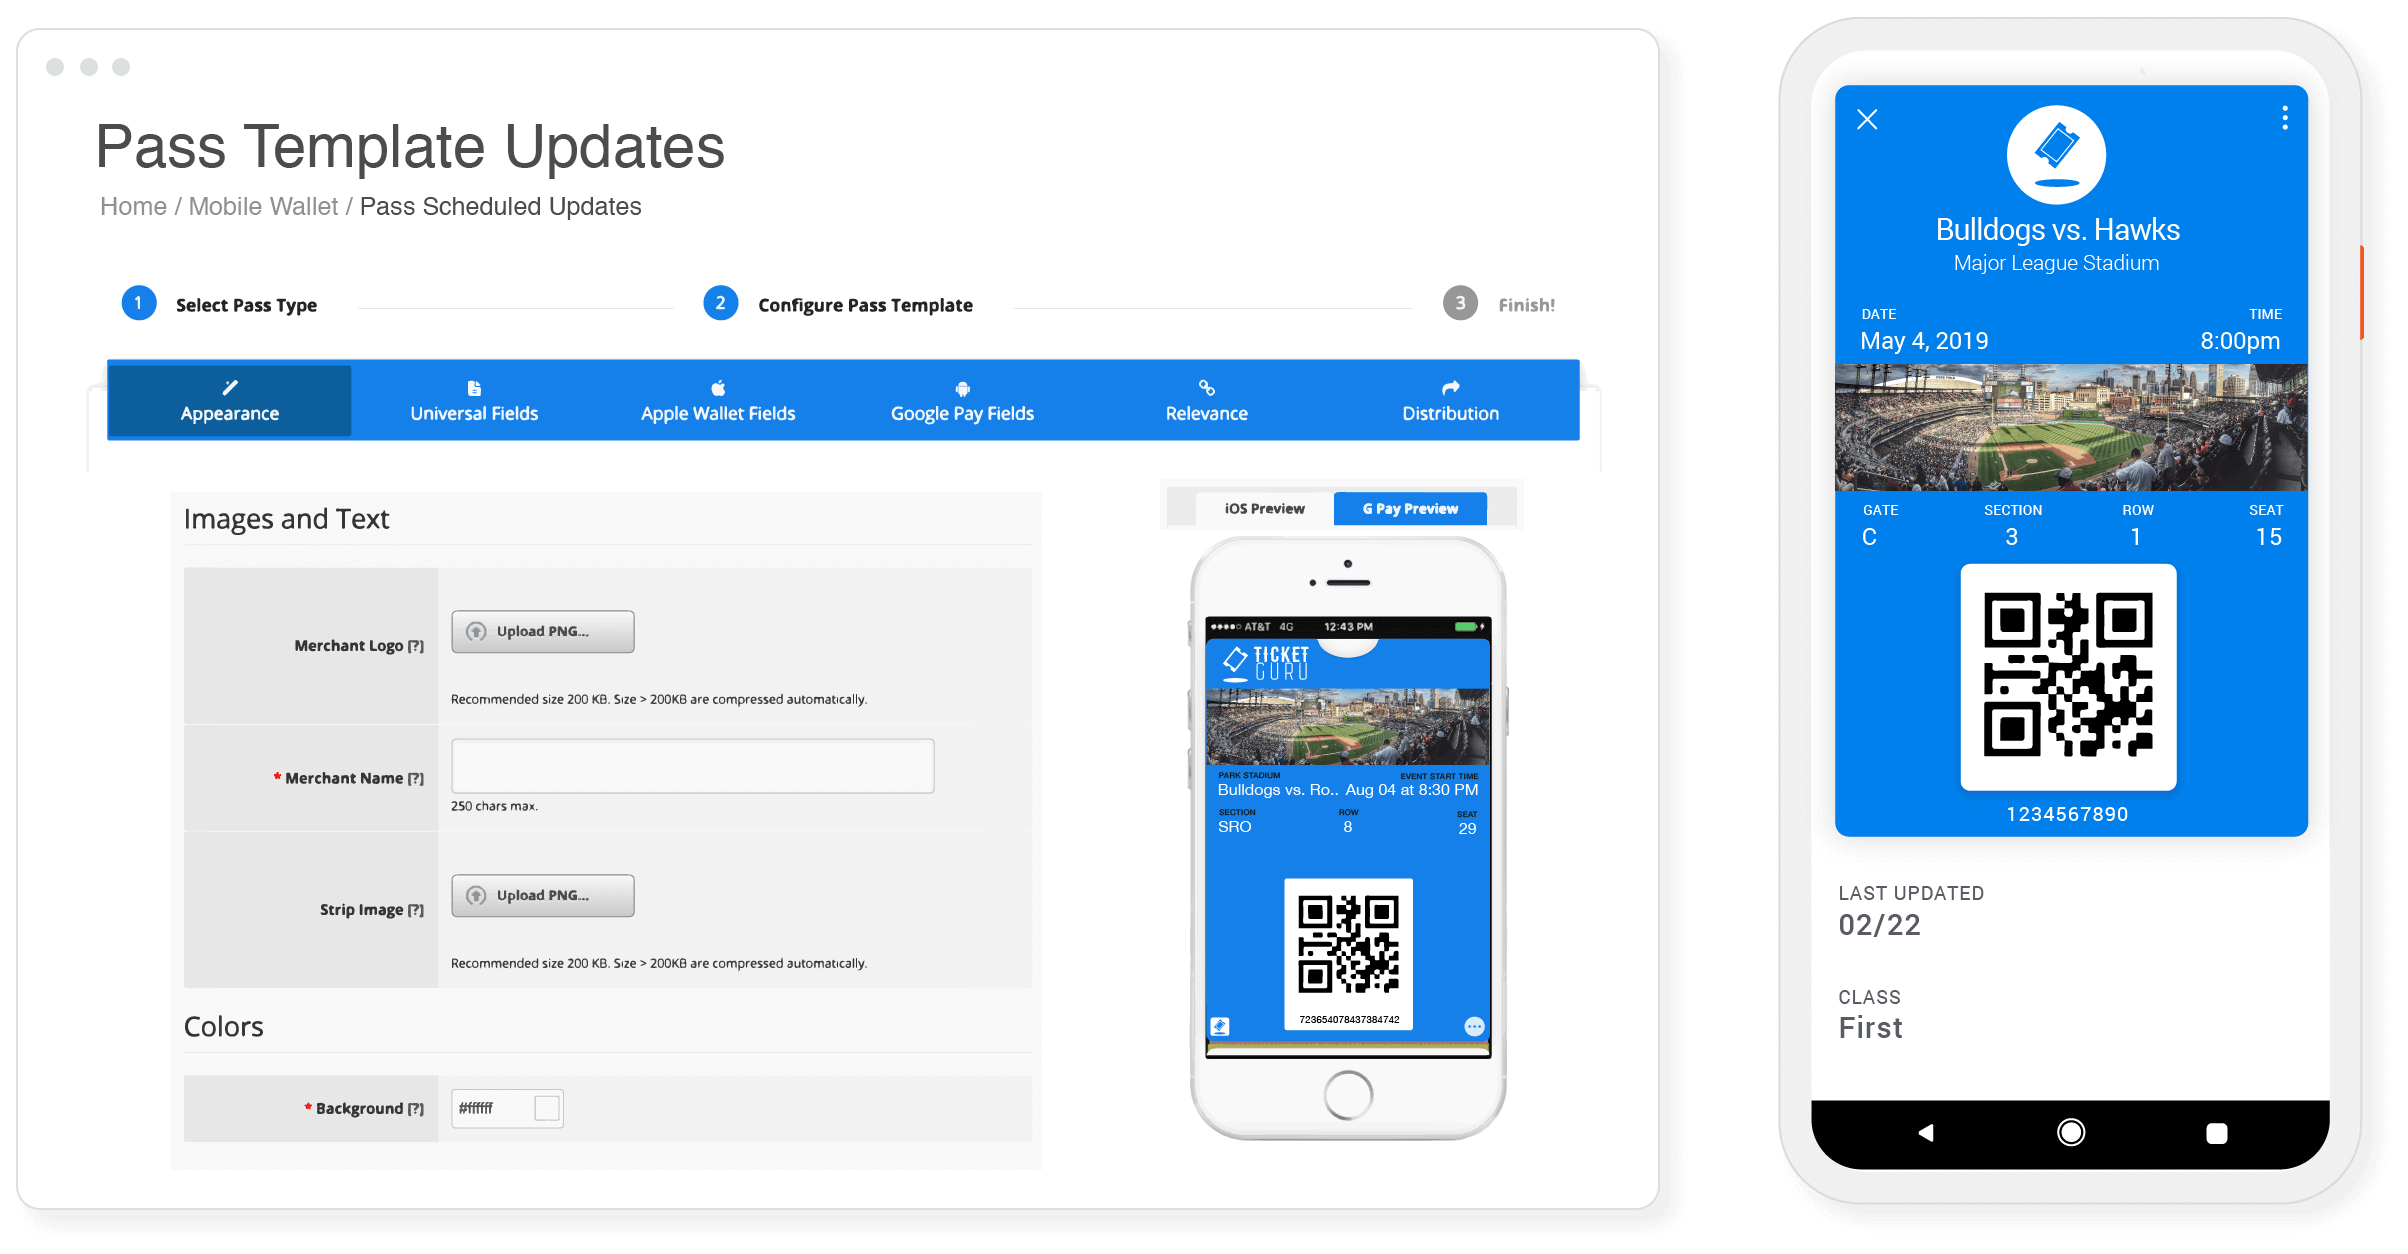 Skycores Mobile Messaging Platform